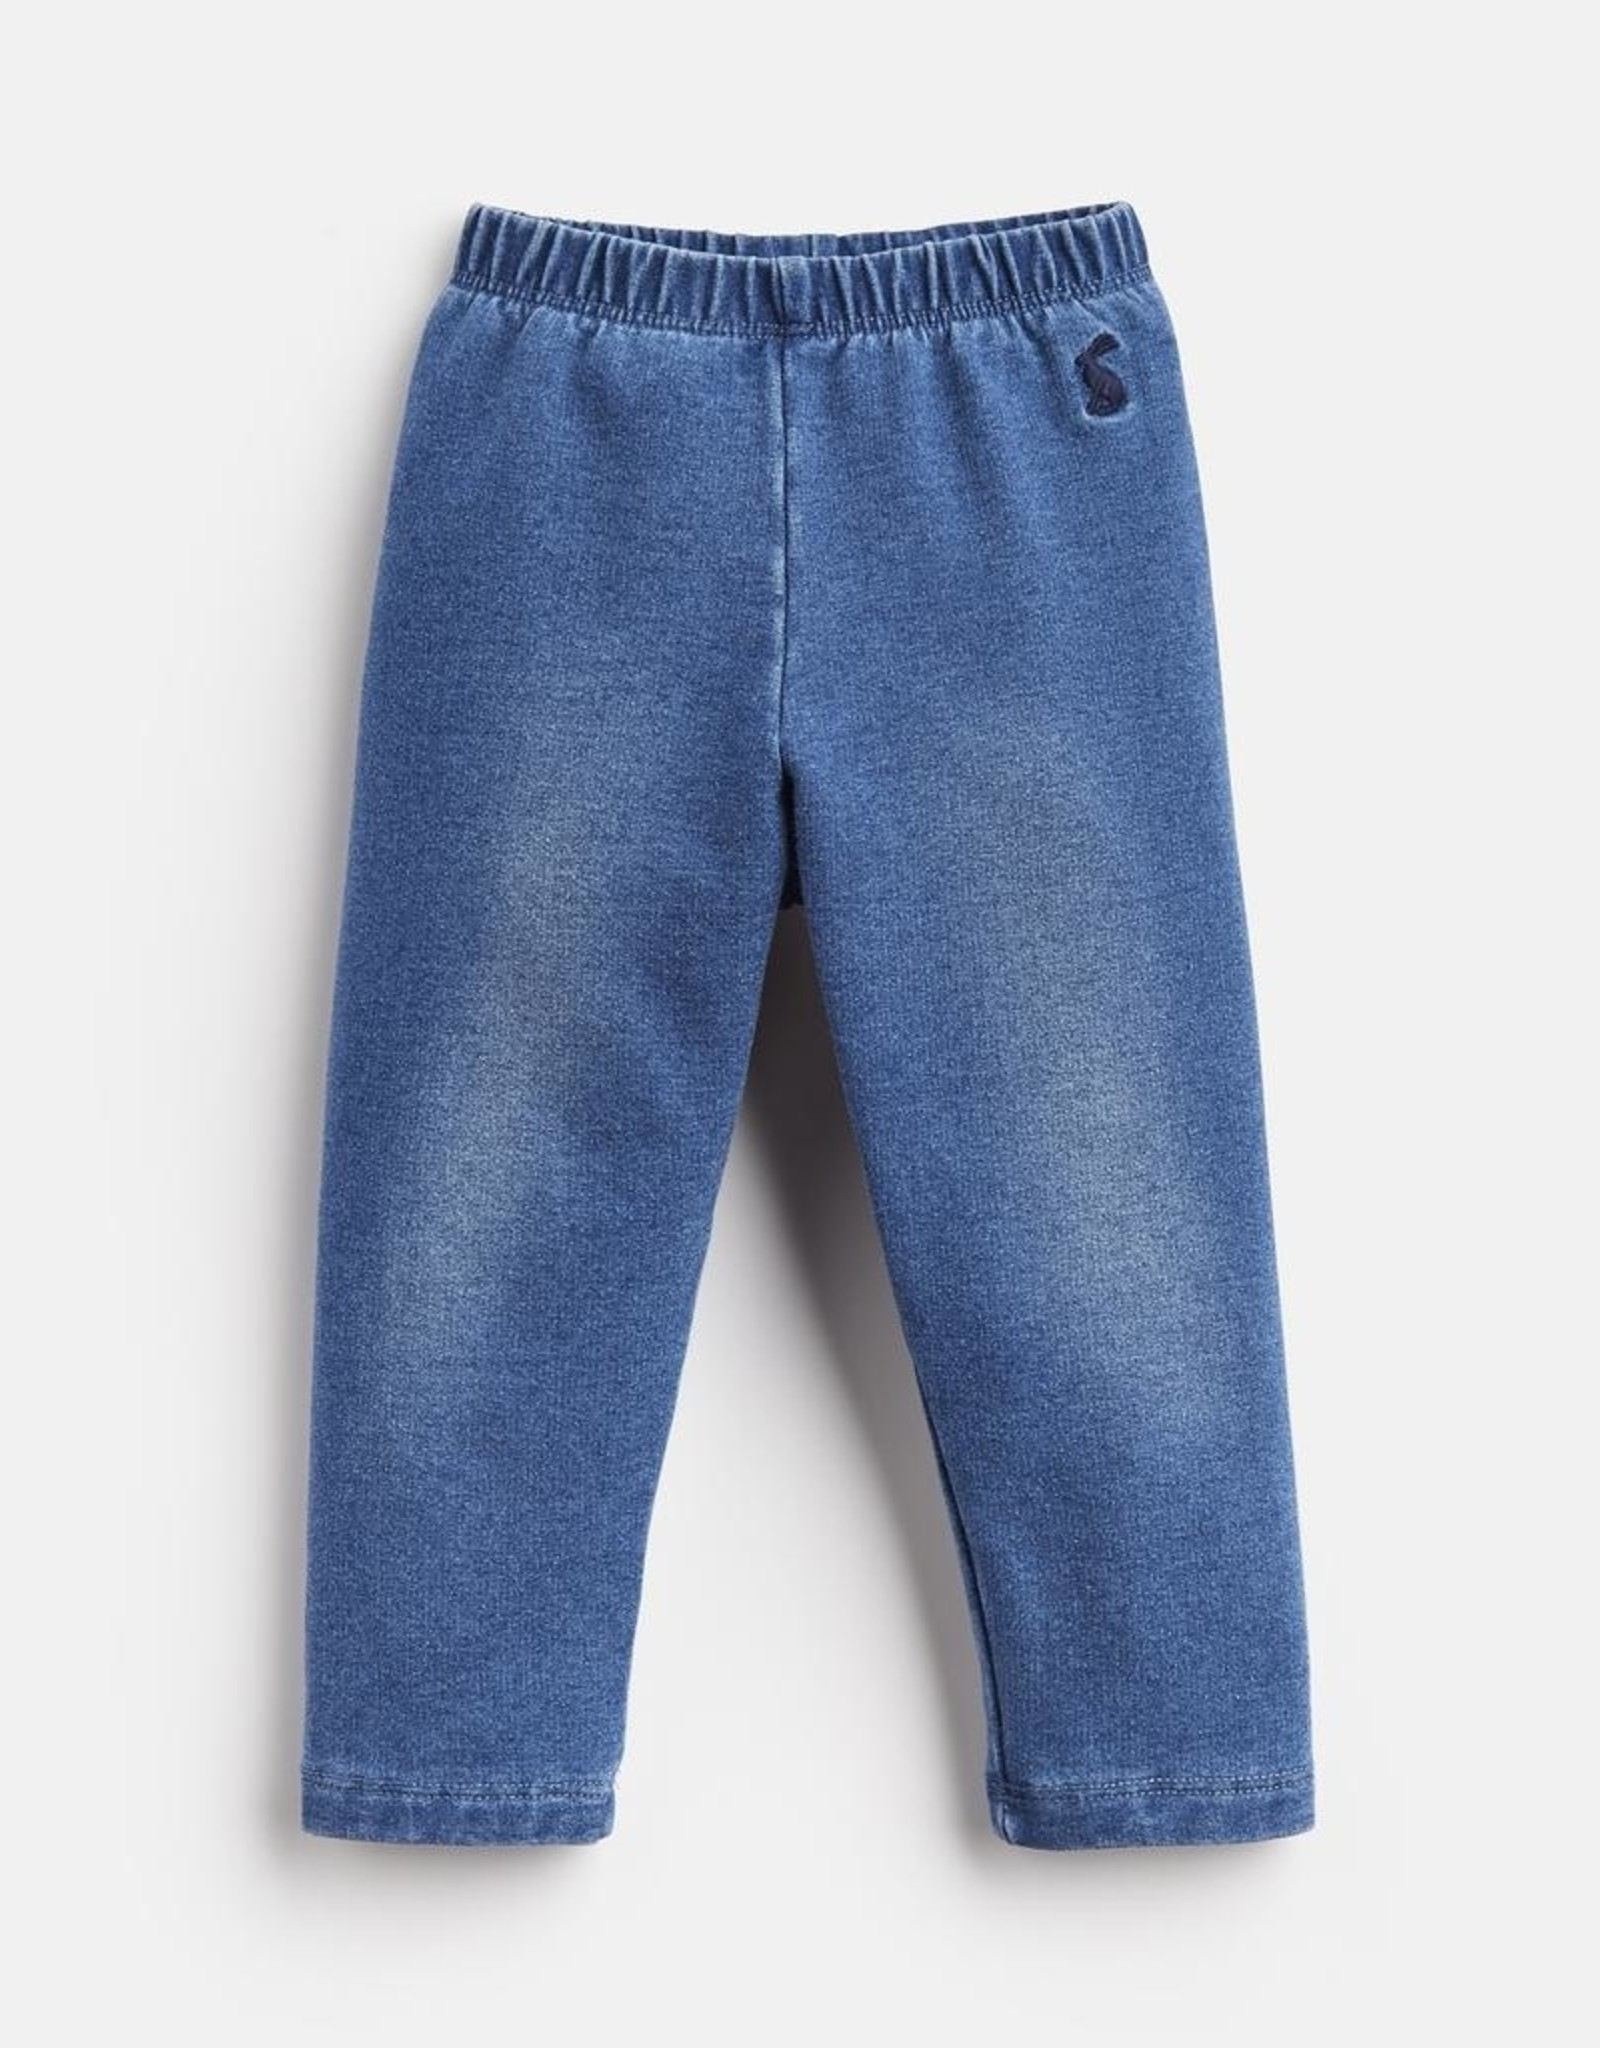 Joules Kids Minnie Jersey Denim Legging